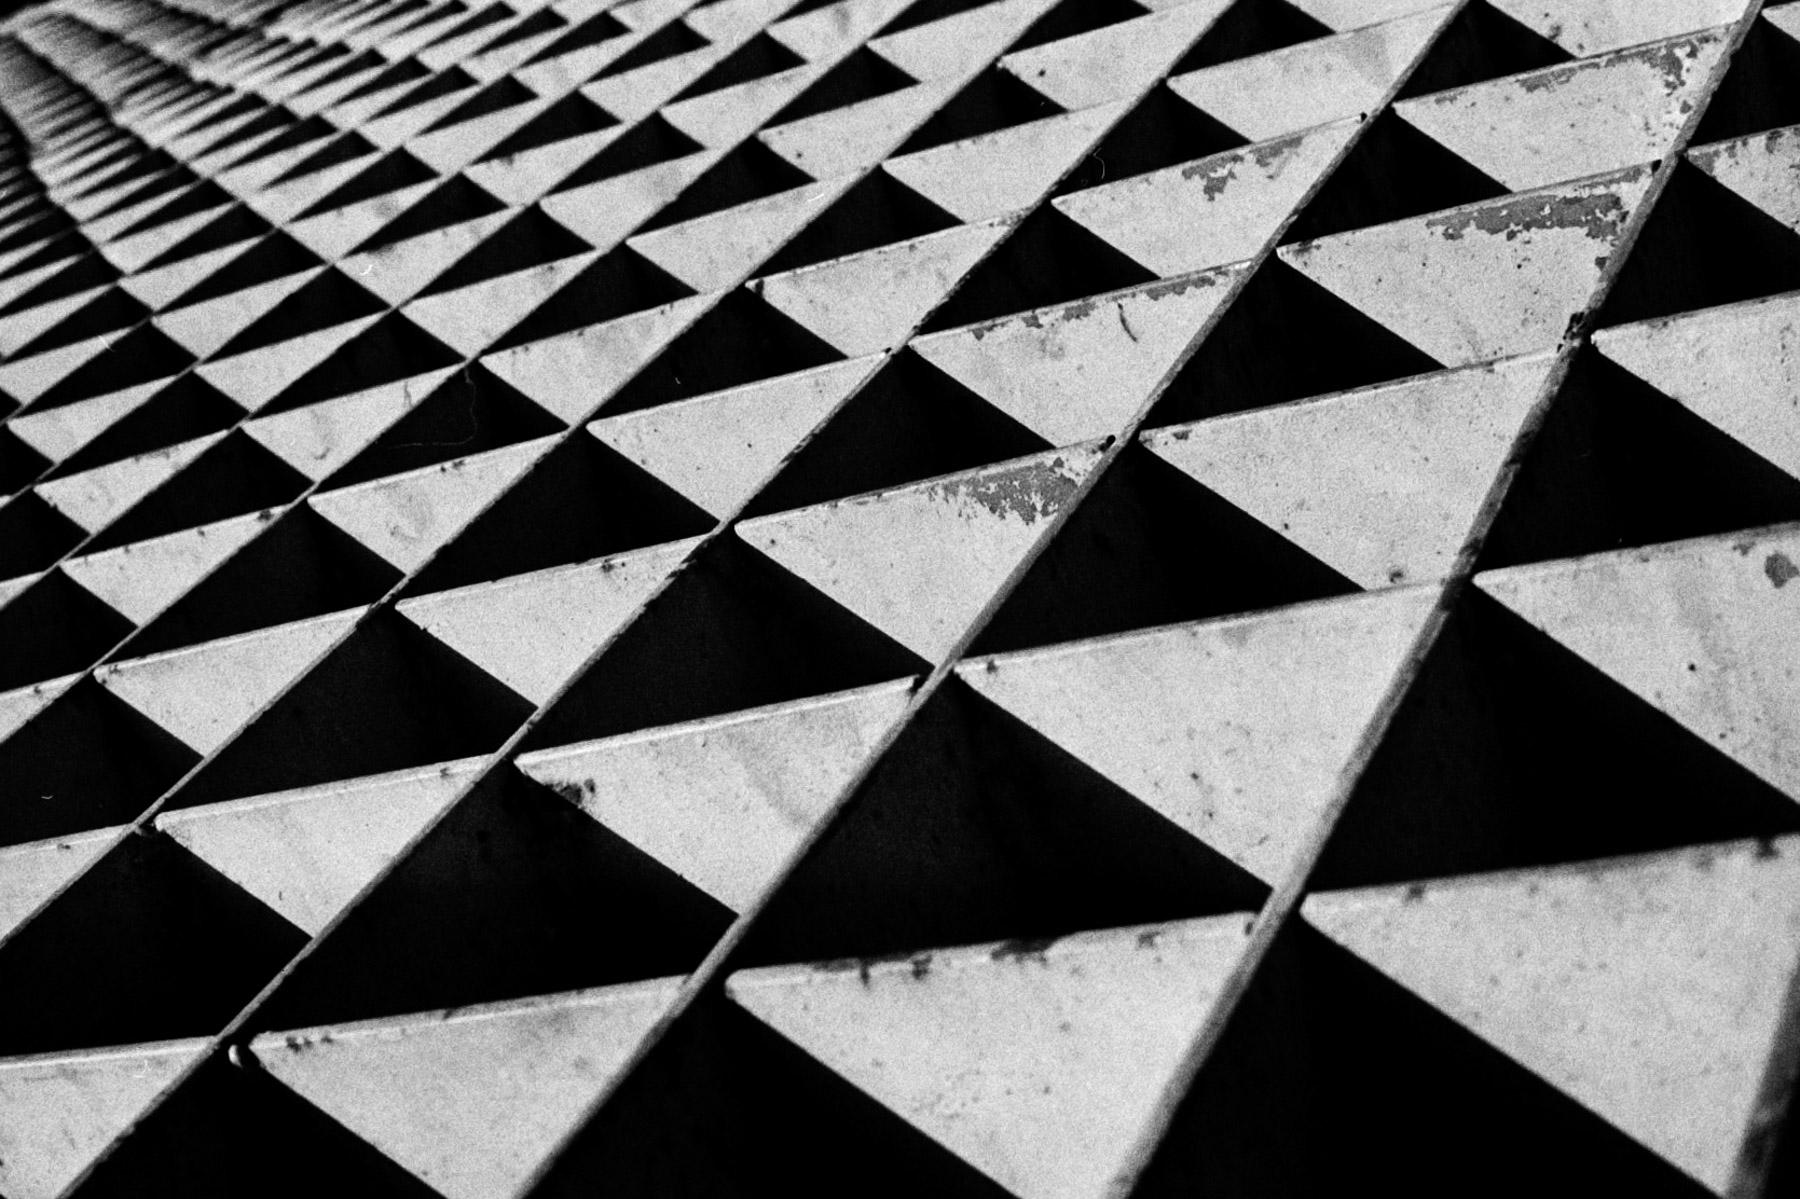 About squares and triangles | Asahi Pentax Spotmatic | Kodak TriX 400 | Efrain Bojorquez